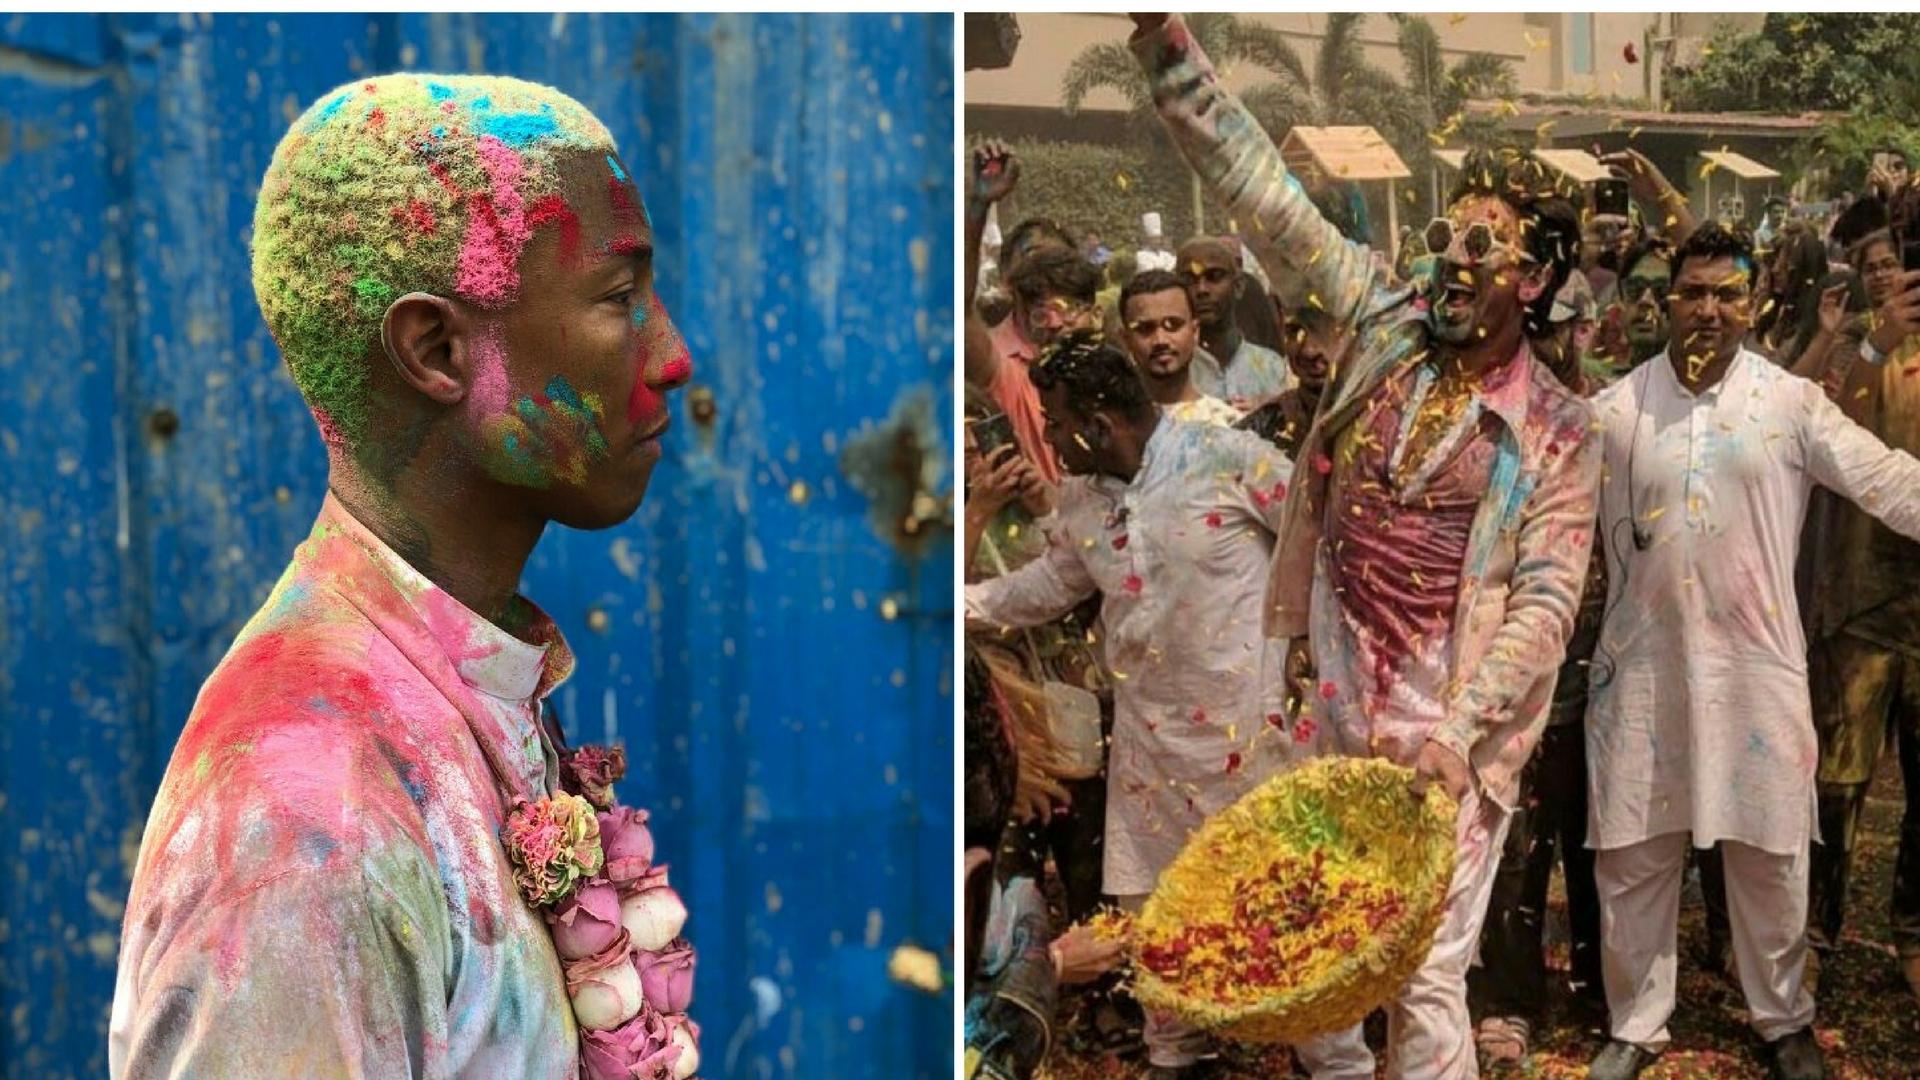 In Pics: Ranveer Singh's 'Happy' Holi With Pharrell Williams